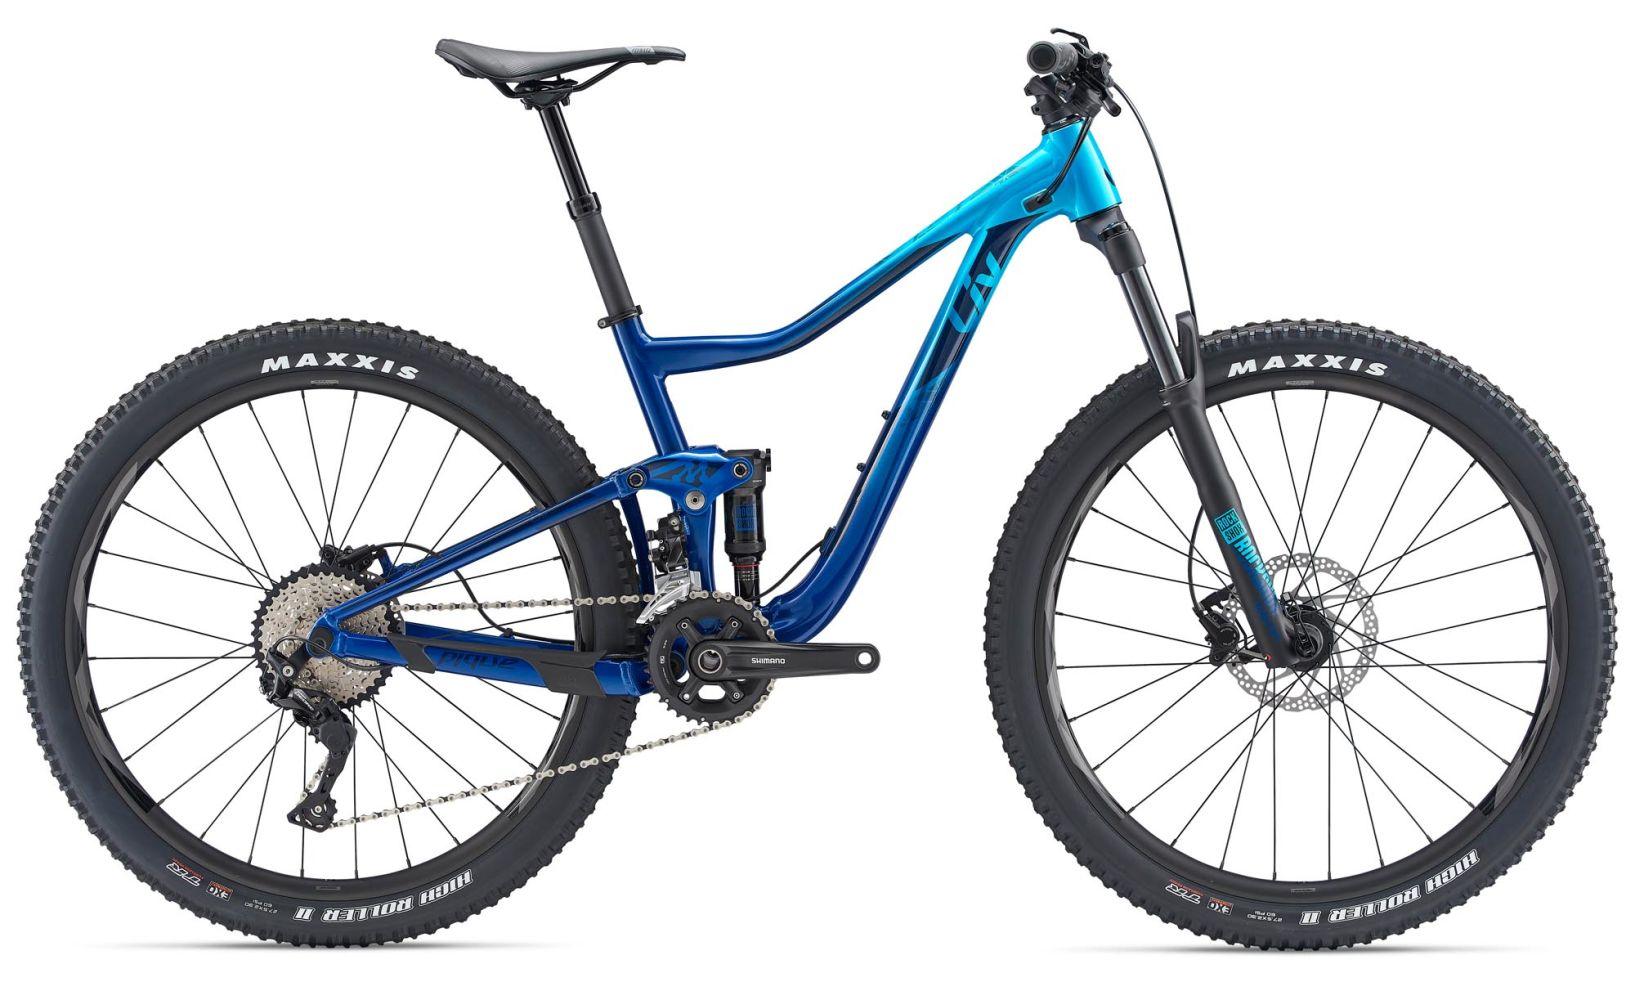 Mountain Bike Rentals - San Diego Bike Shop | Moment Bicycles